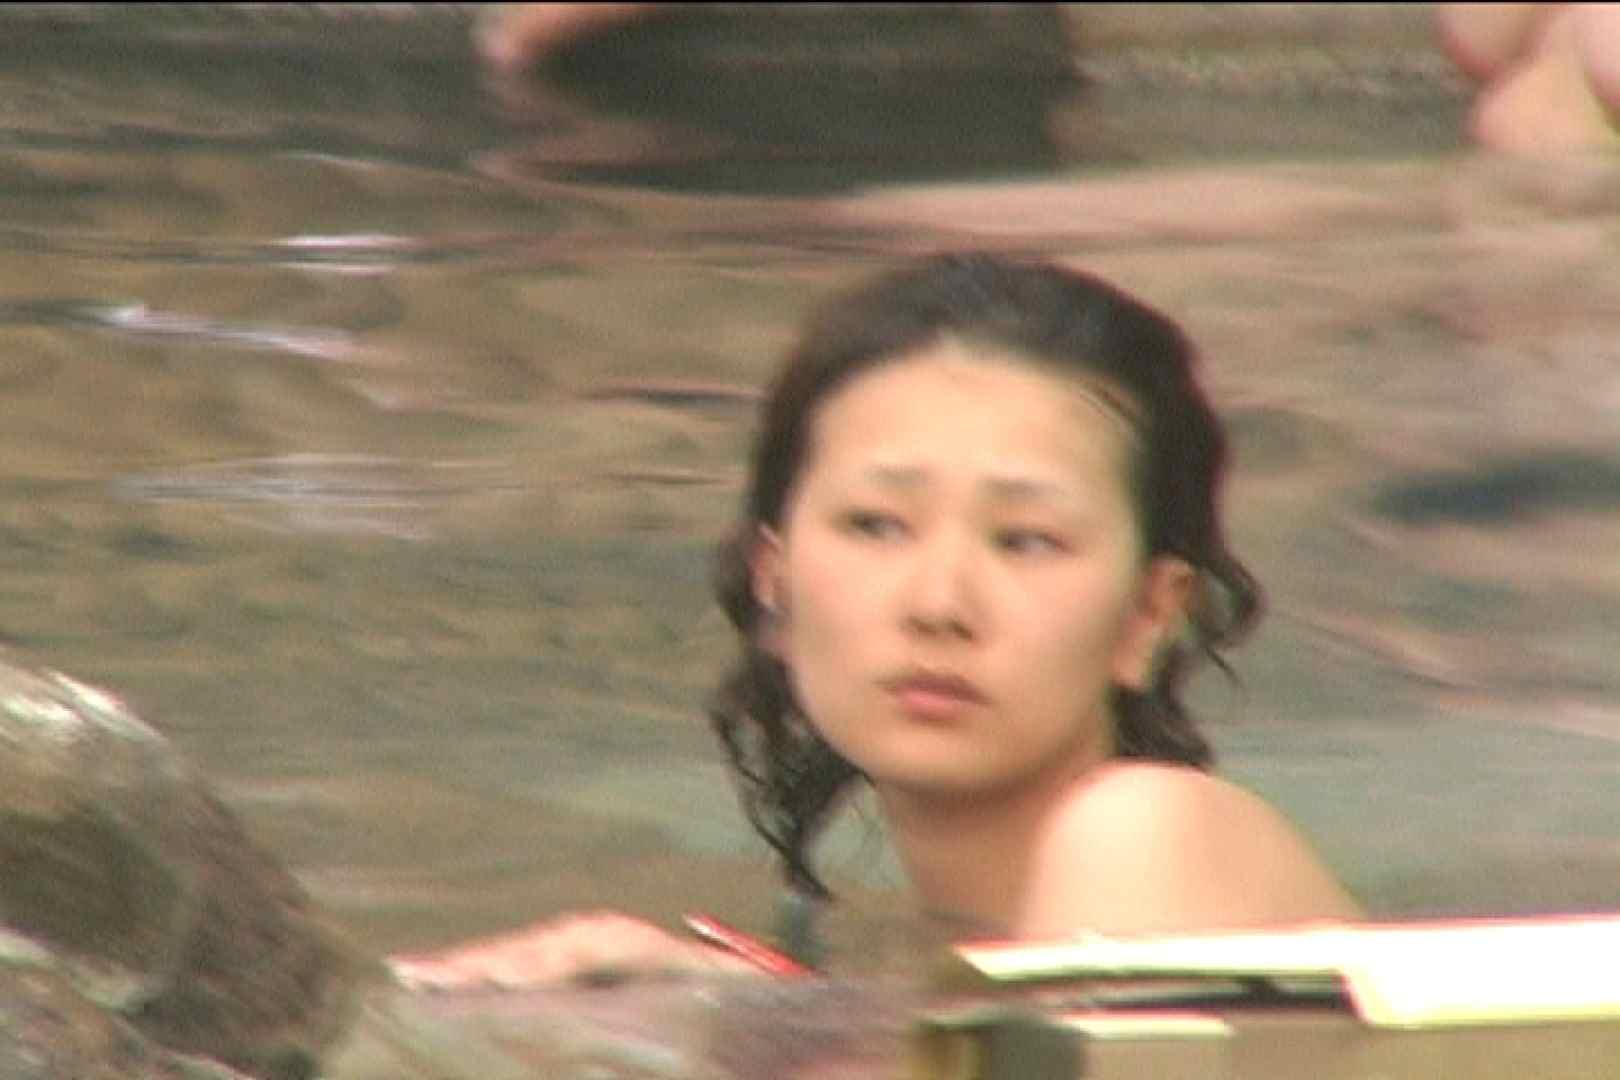 Aquaな露天風呂Vol.131 女体盗撮 覗きスケベ動画紹介 82連発 2